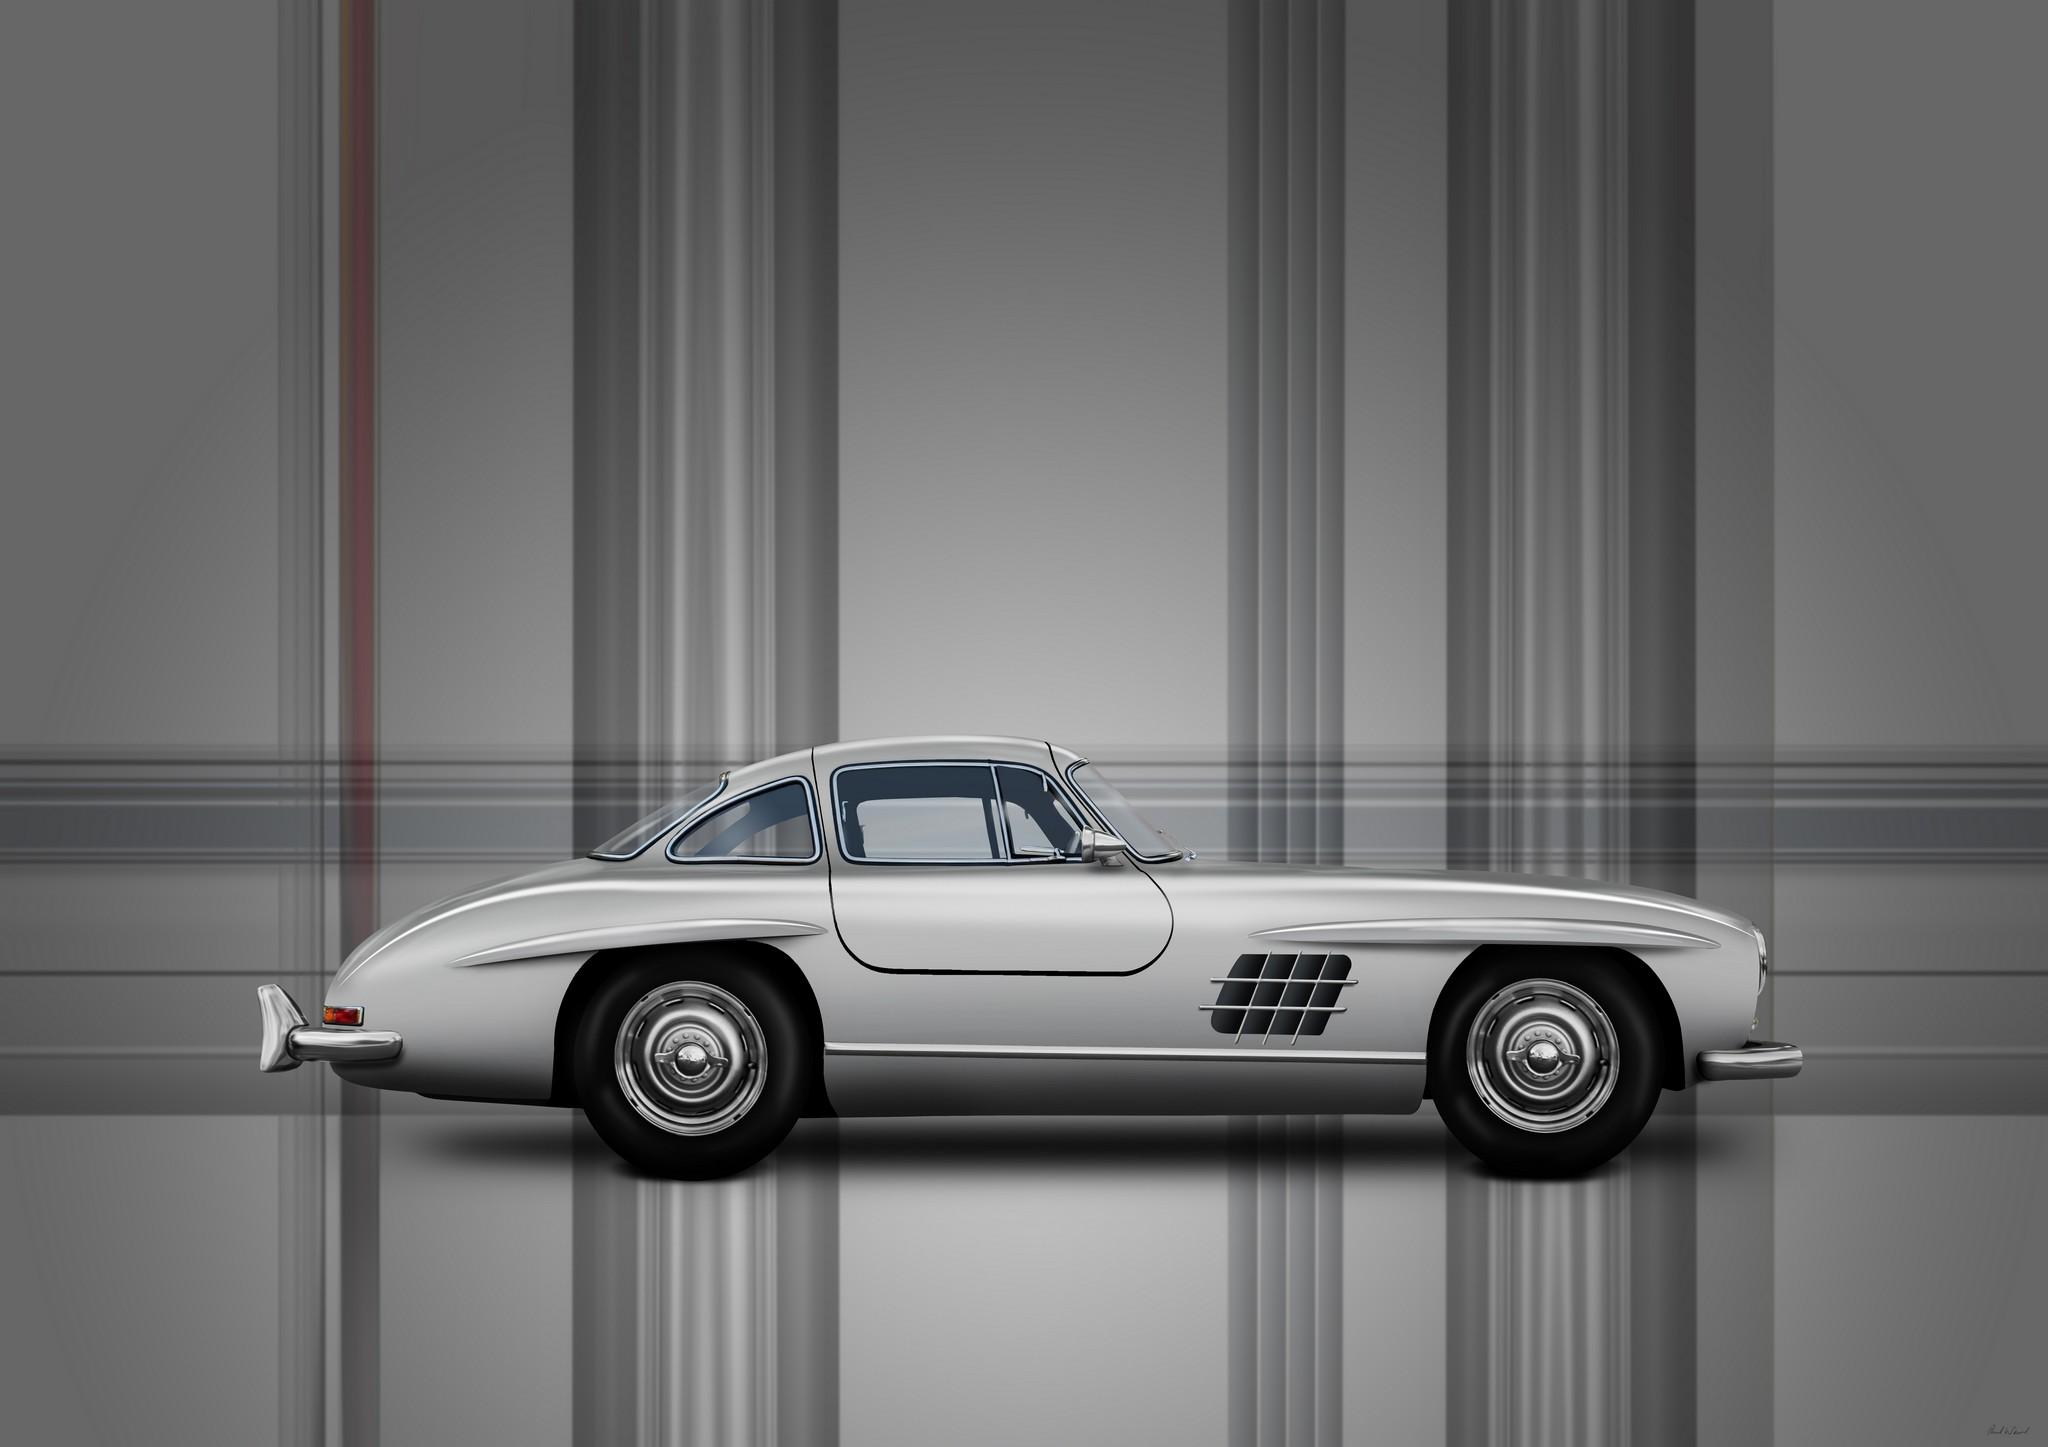 Mercedes benz 300SL Gullwing car art by Automotive artist Paul Ward, car photography, automotive art